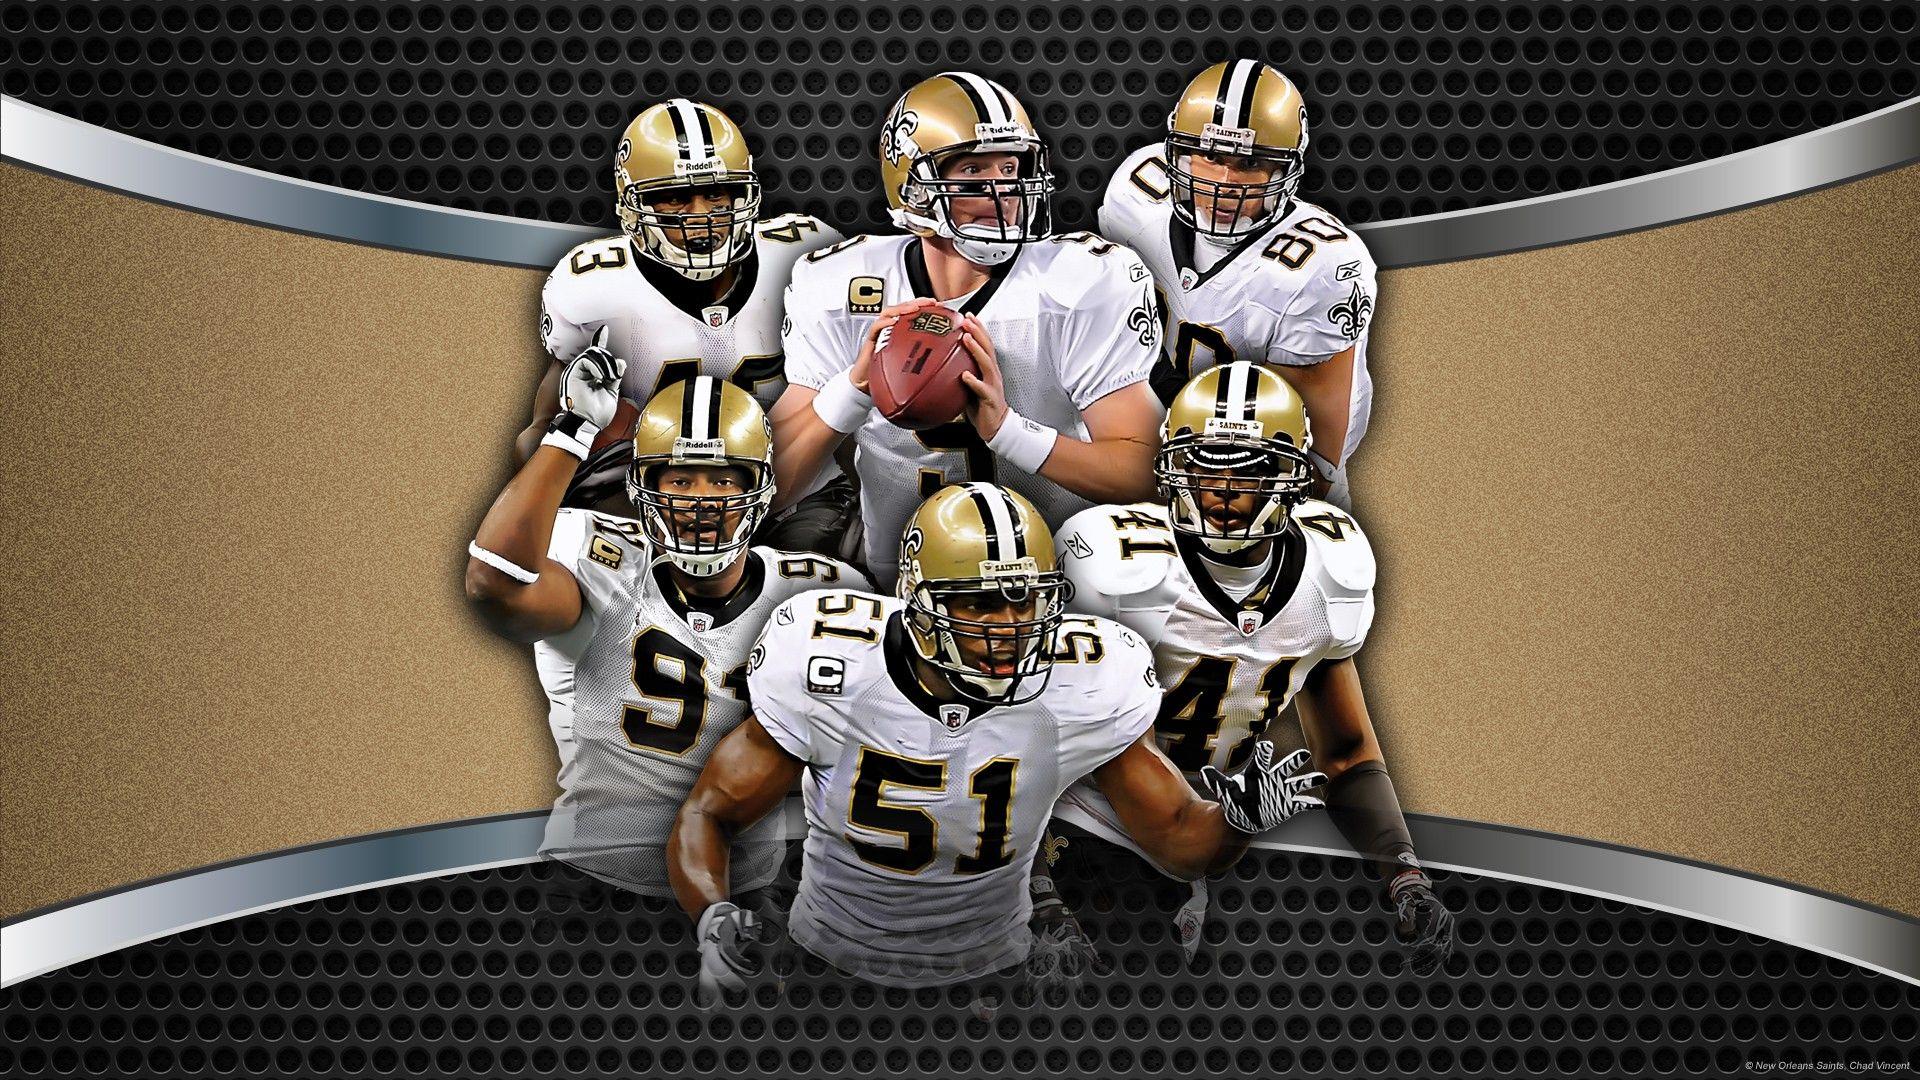 New Orleans Saints Wallpaper 2020 Nfl Football Wallpapers Nfl Football Wallpaper Football Wallpaper Saints Football